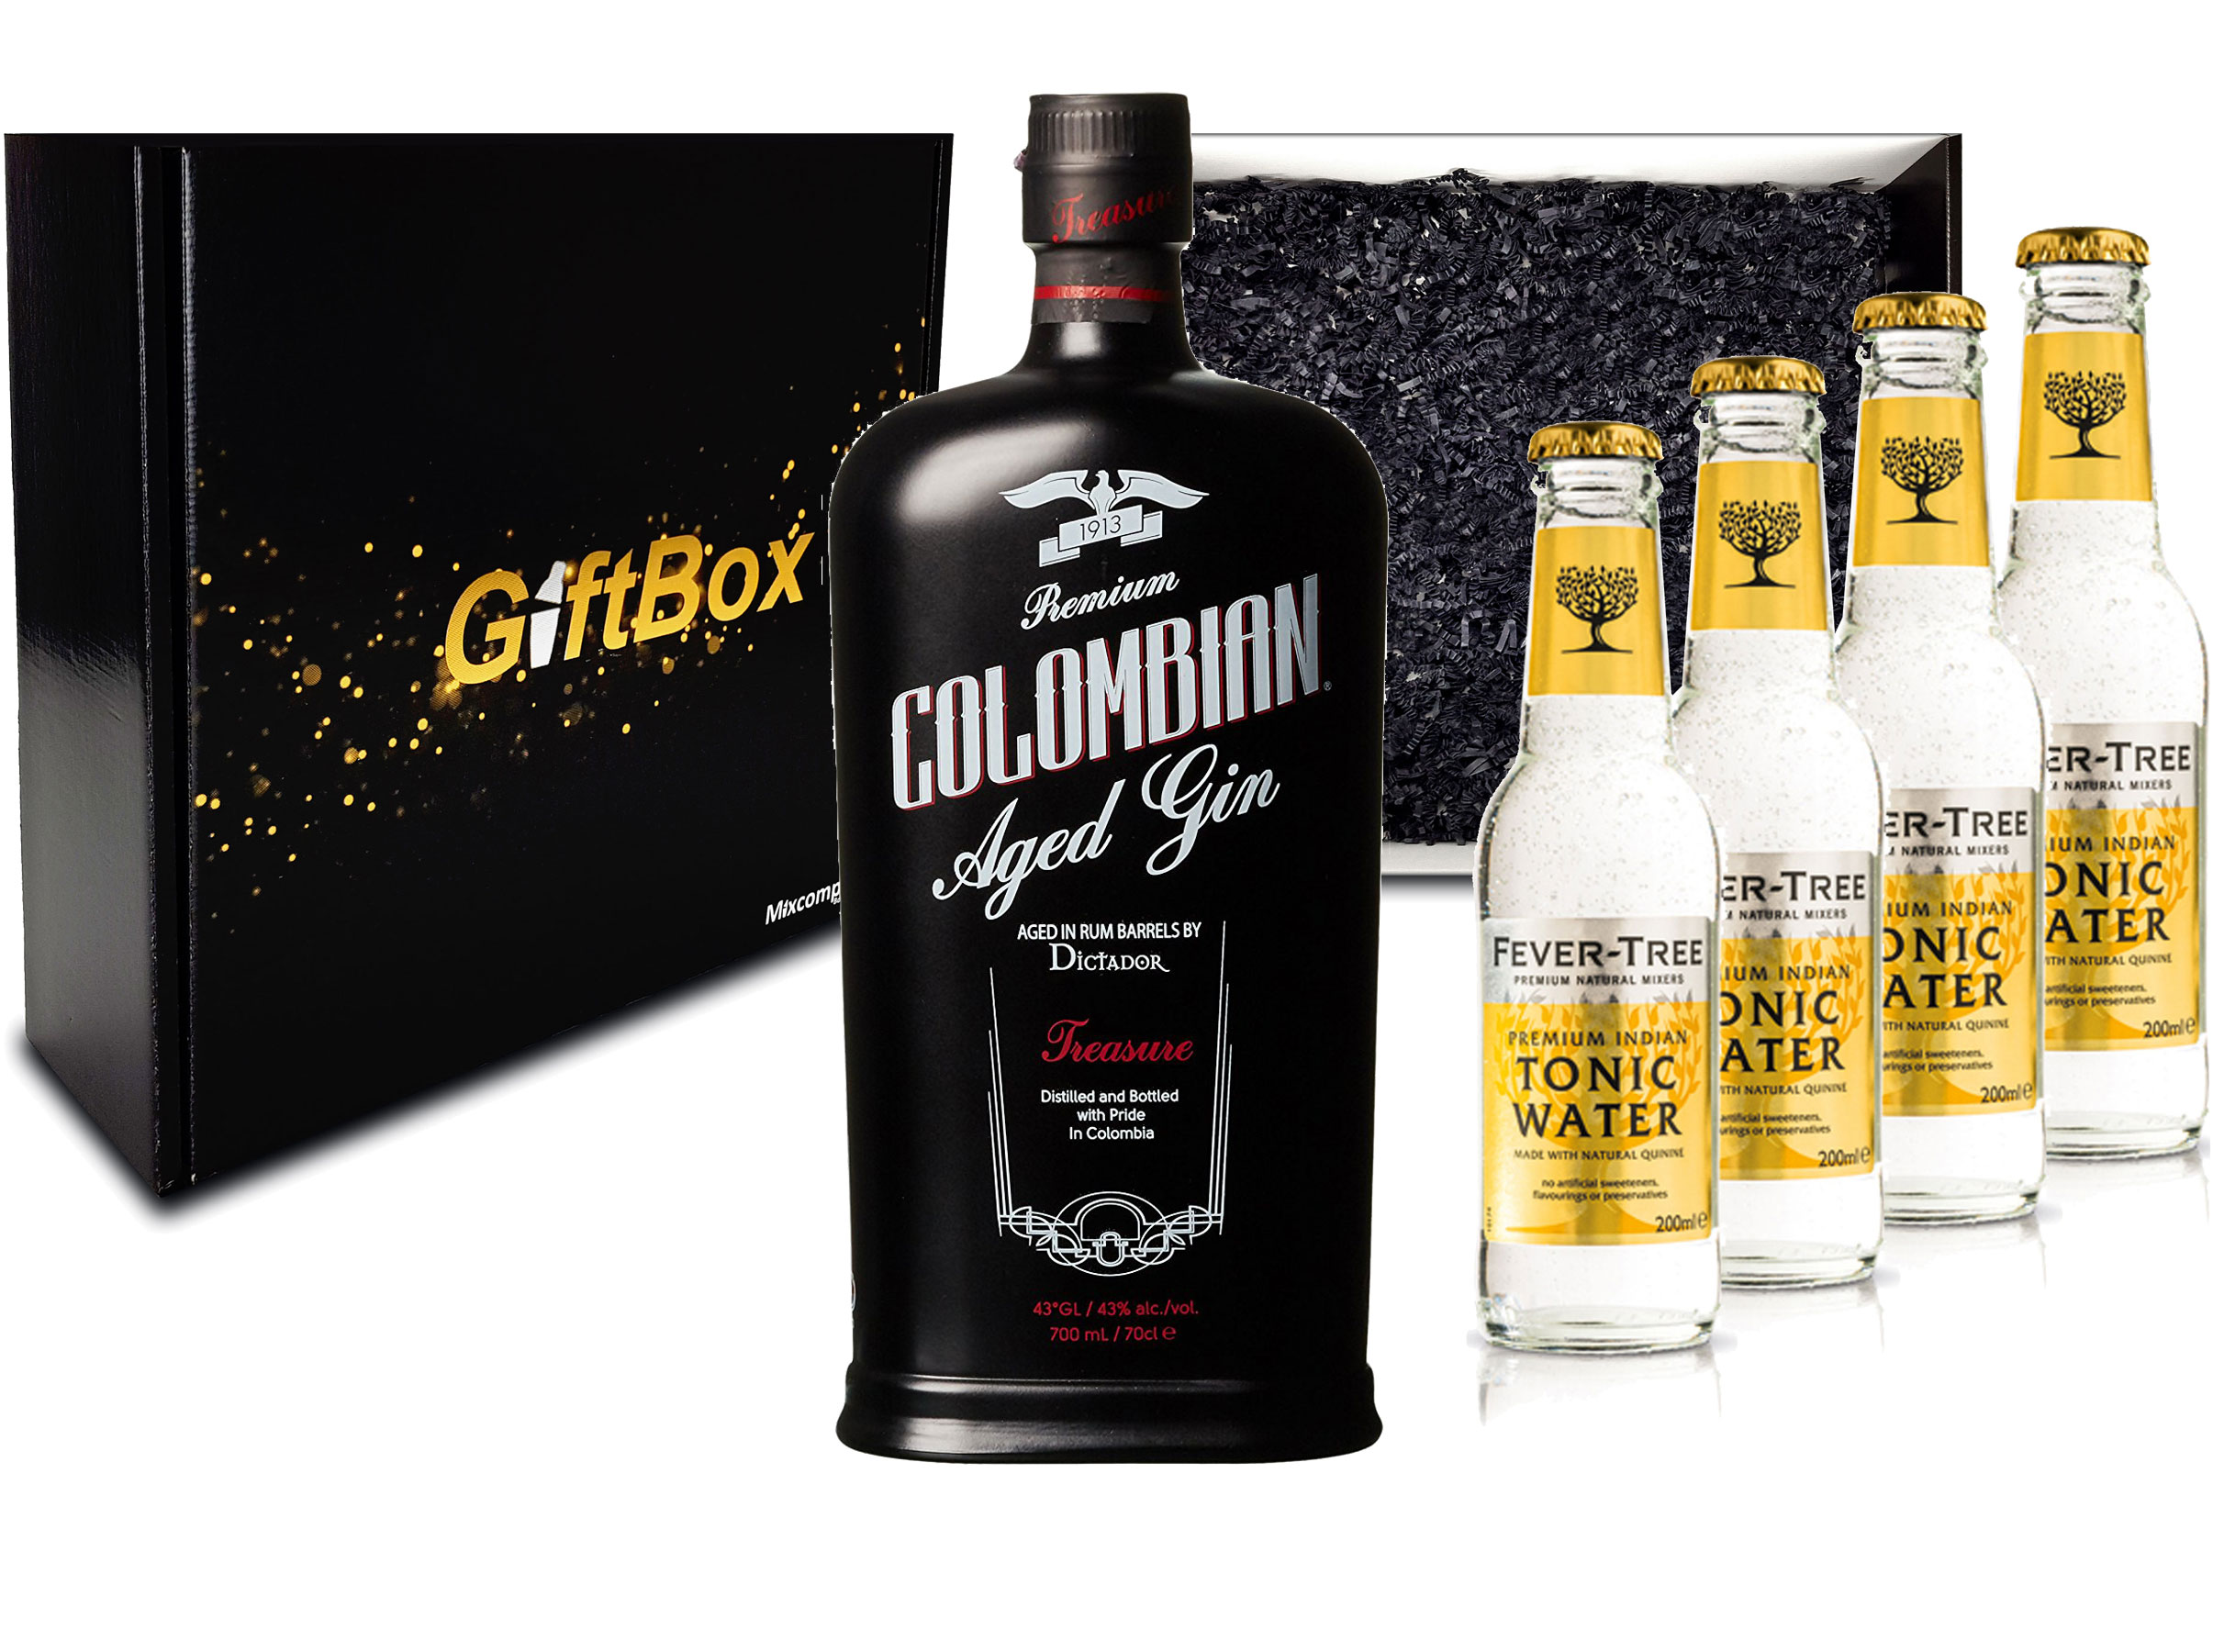 Gin Tonic Giftbox Geschenkset - Dictador Colombian Aged Gin Black 0,7l 700ml (43% Vol) + 4x Fever Tree Tonic Water 200ml inkl. Pfand MEHRWEG -[Enthält Sulfite]